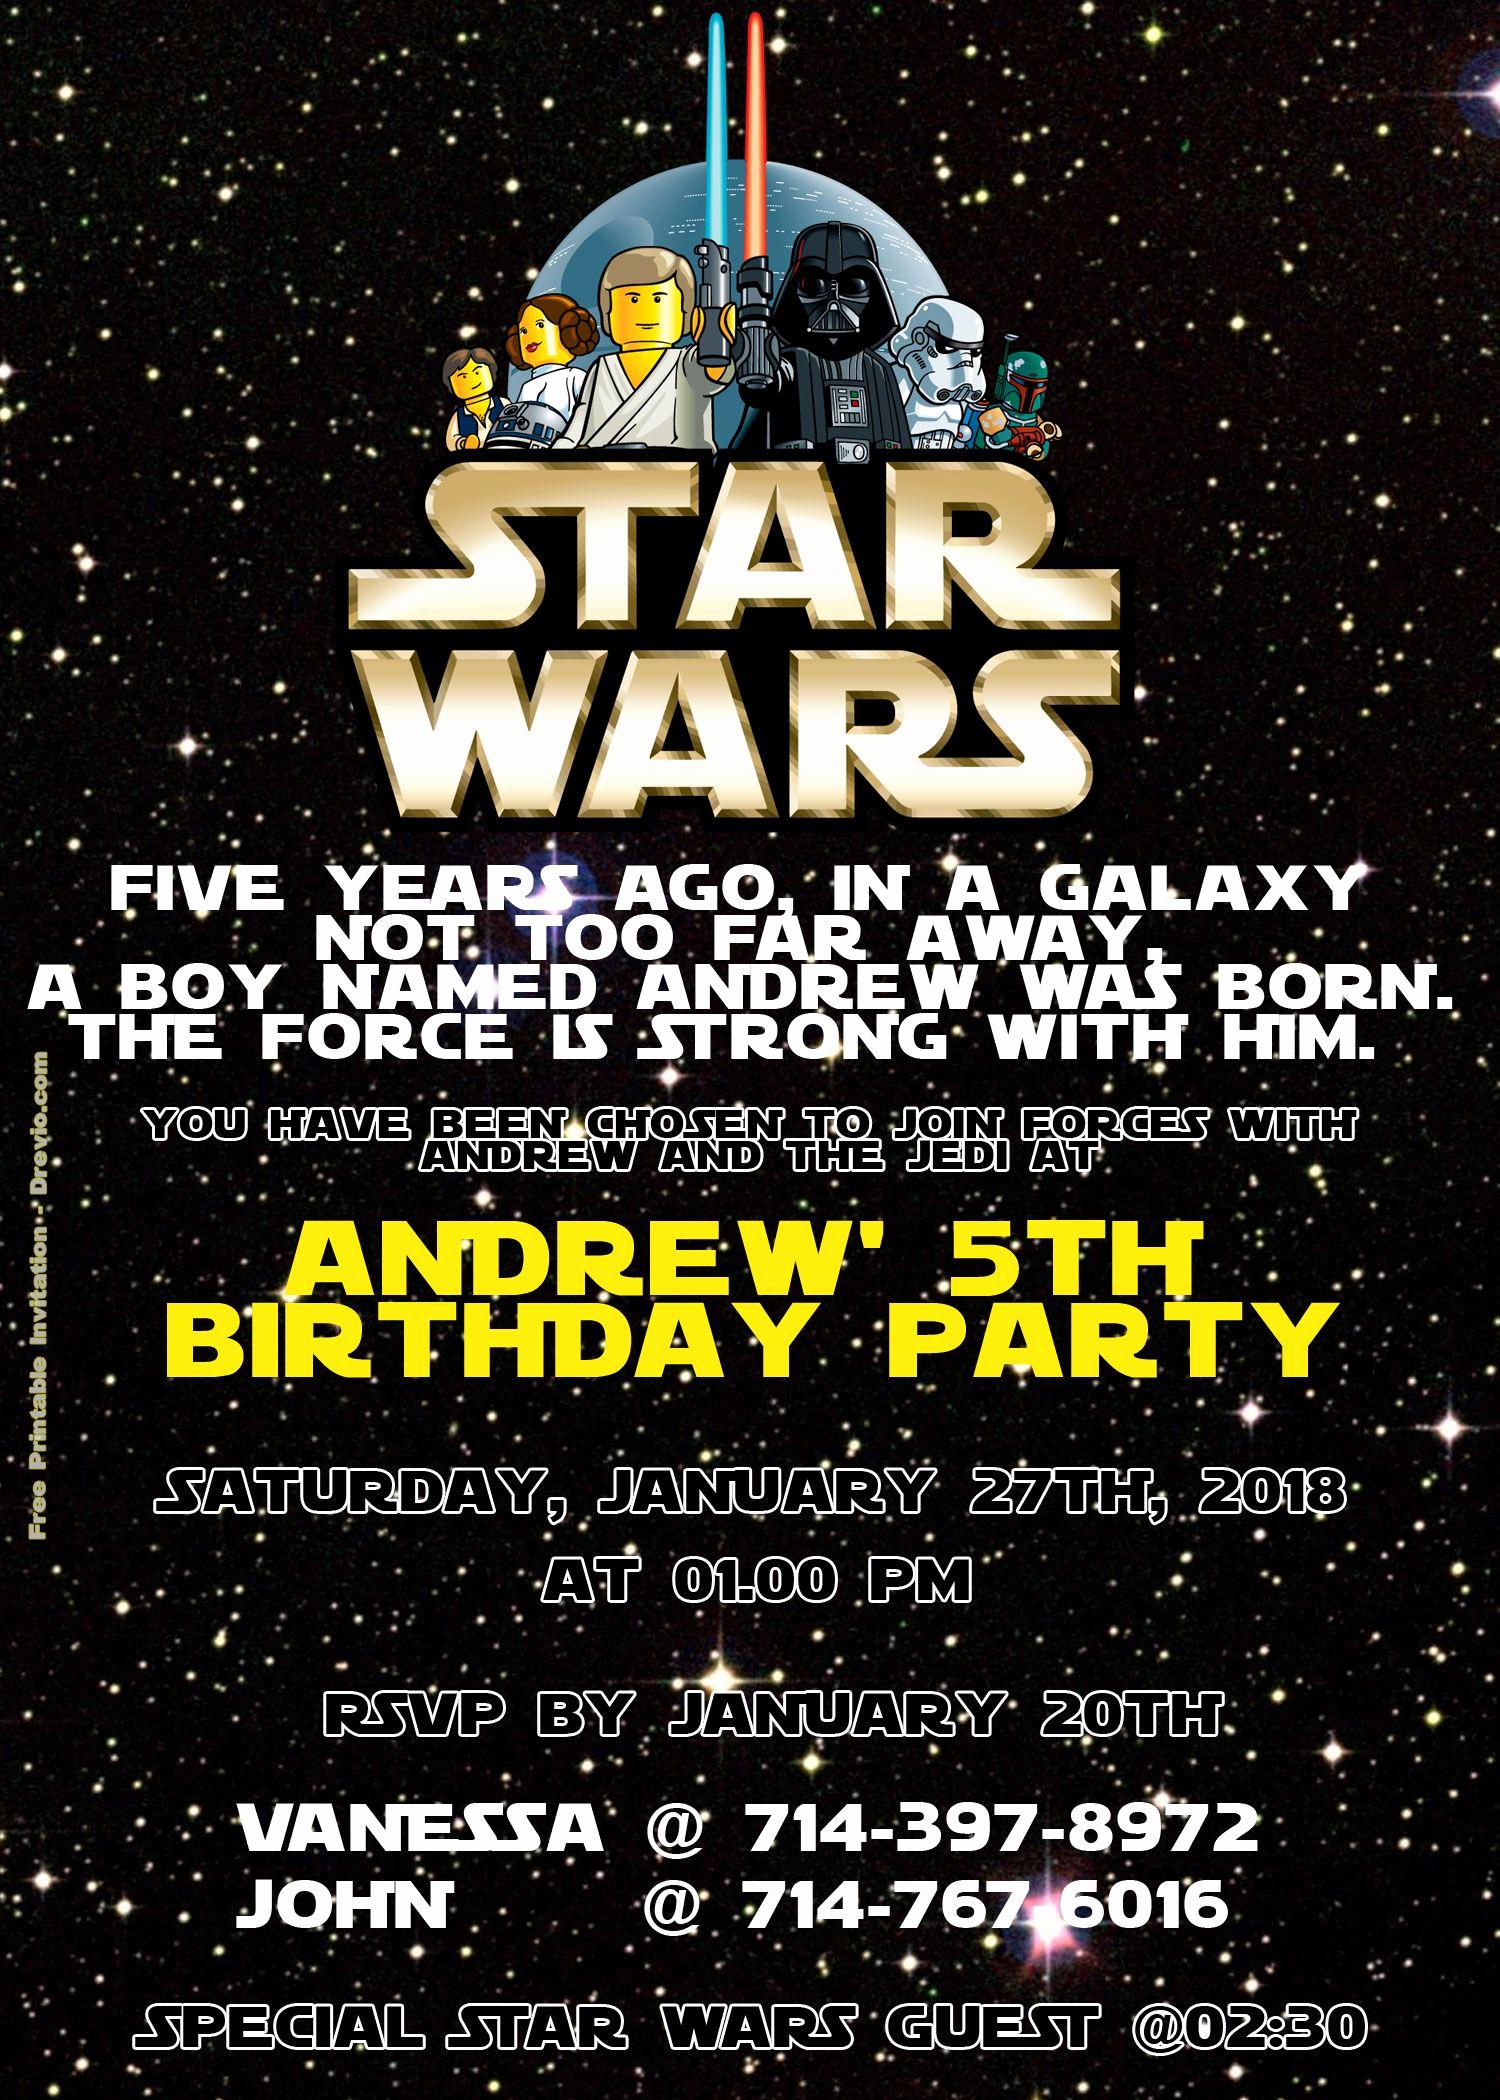 Star Wars Birthday Invitation Template New Free Lego Star Wars Birthday Invitation Psd